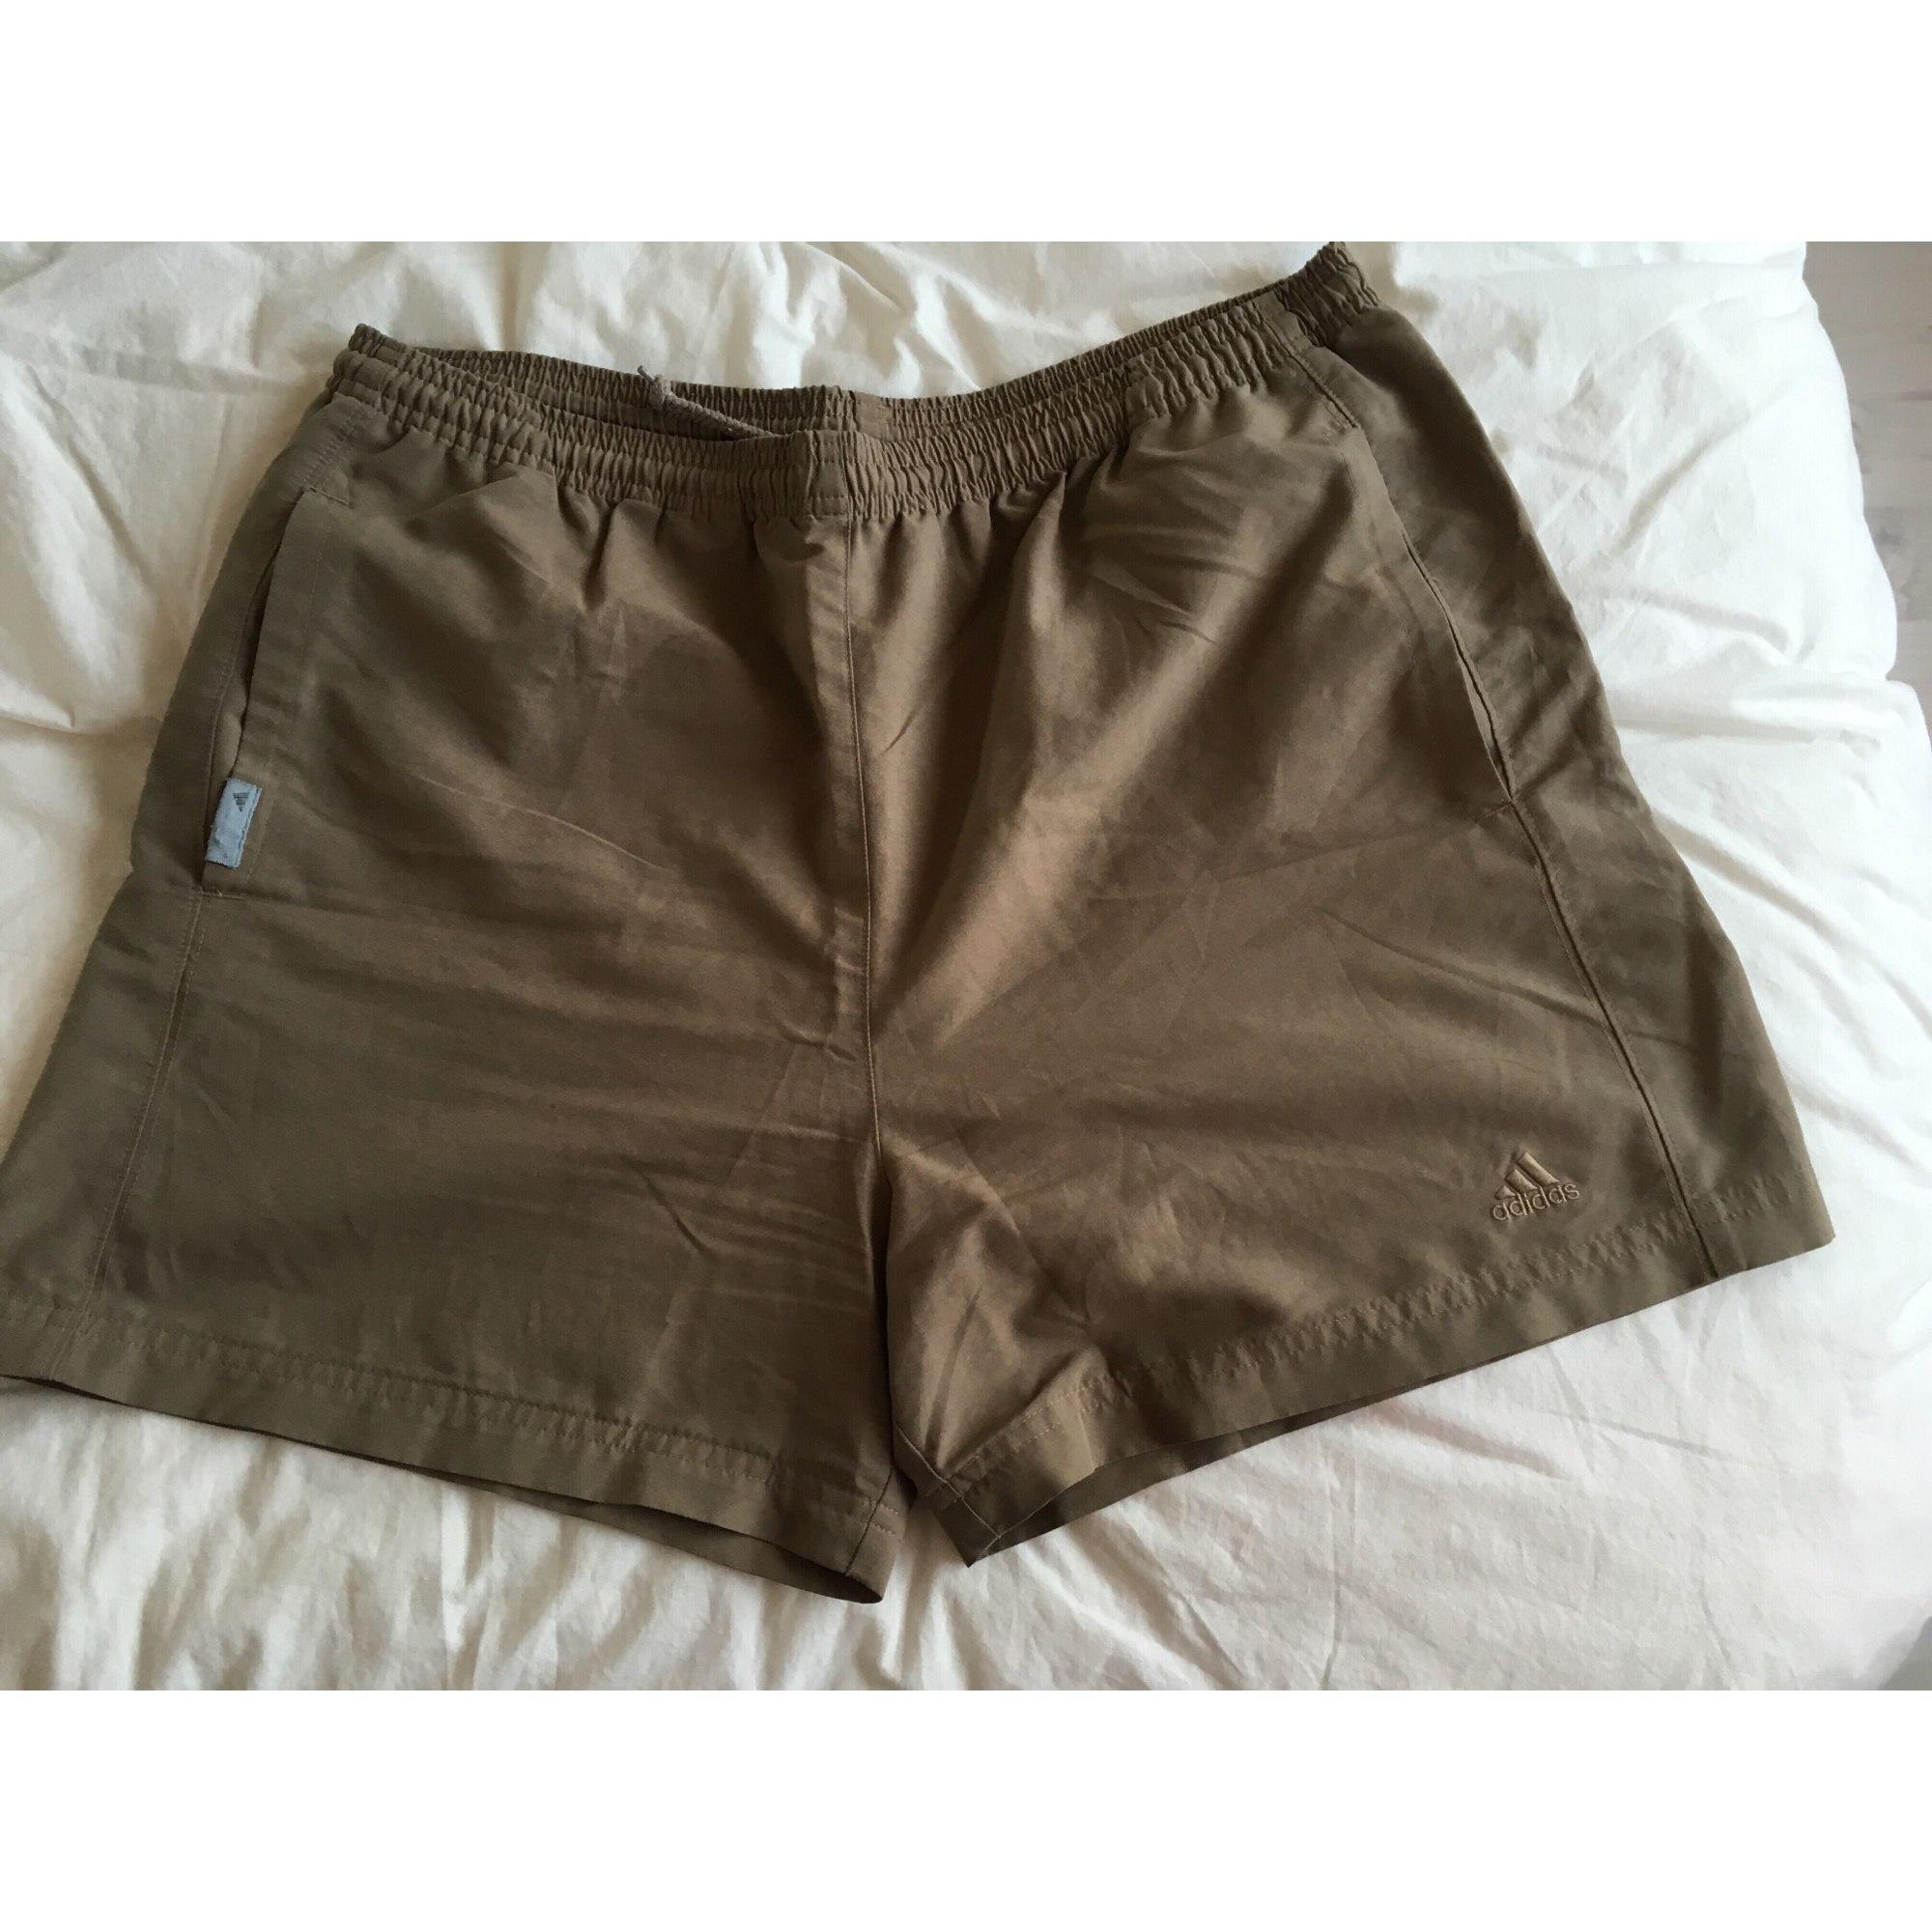 T5 Marron Pantalon 7932297 xlxxl 44 Survêtement De Adidas XTZzq7